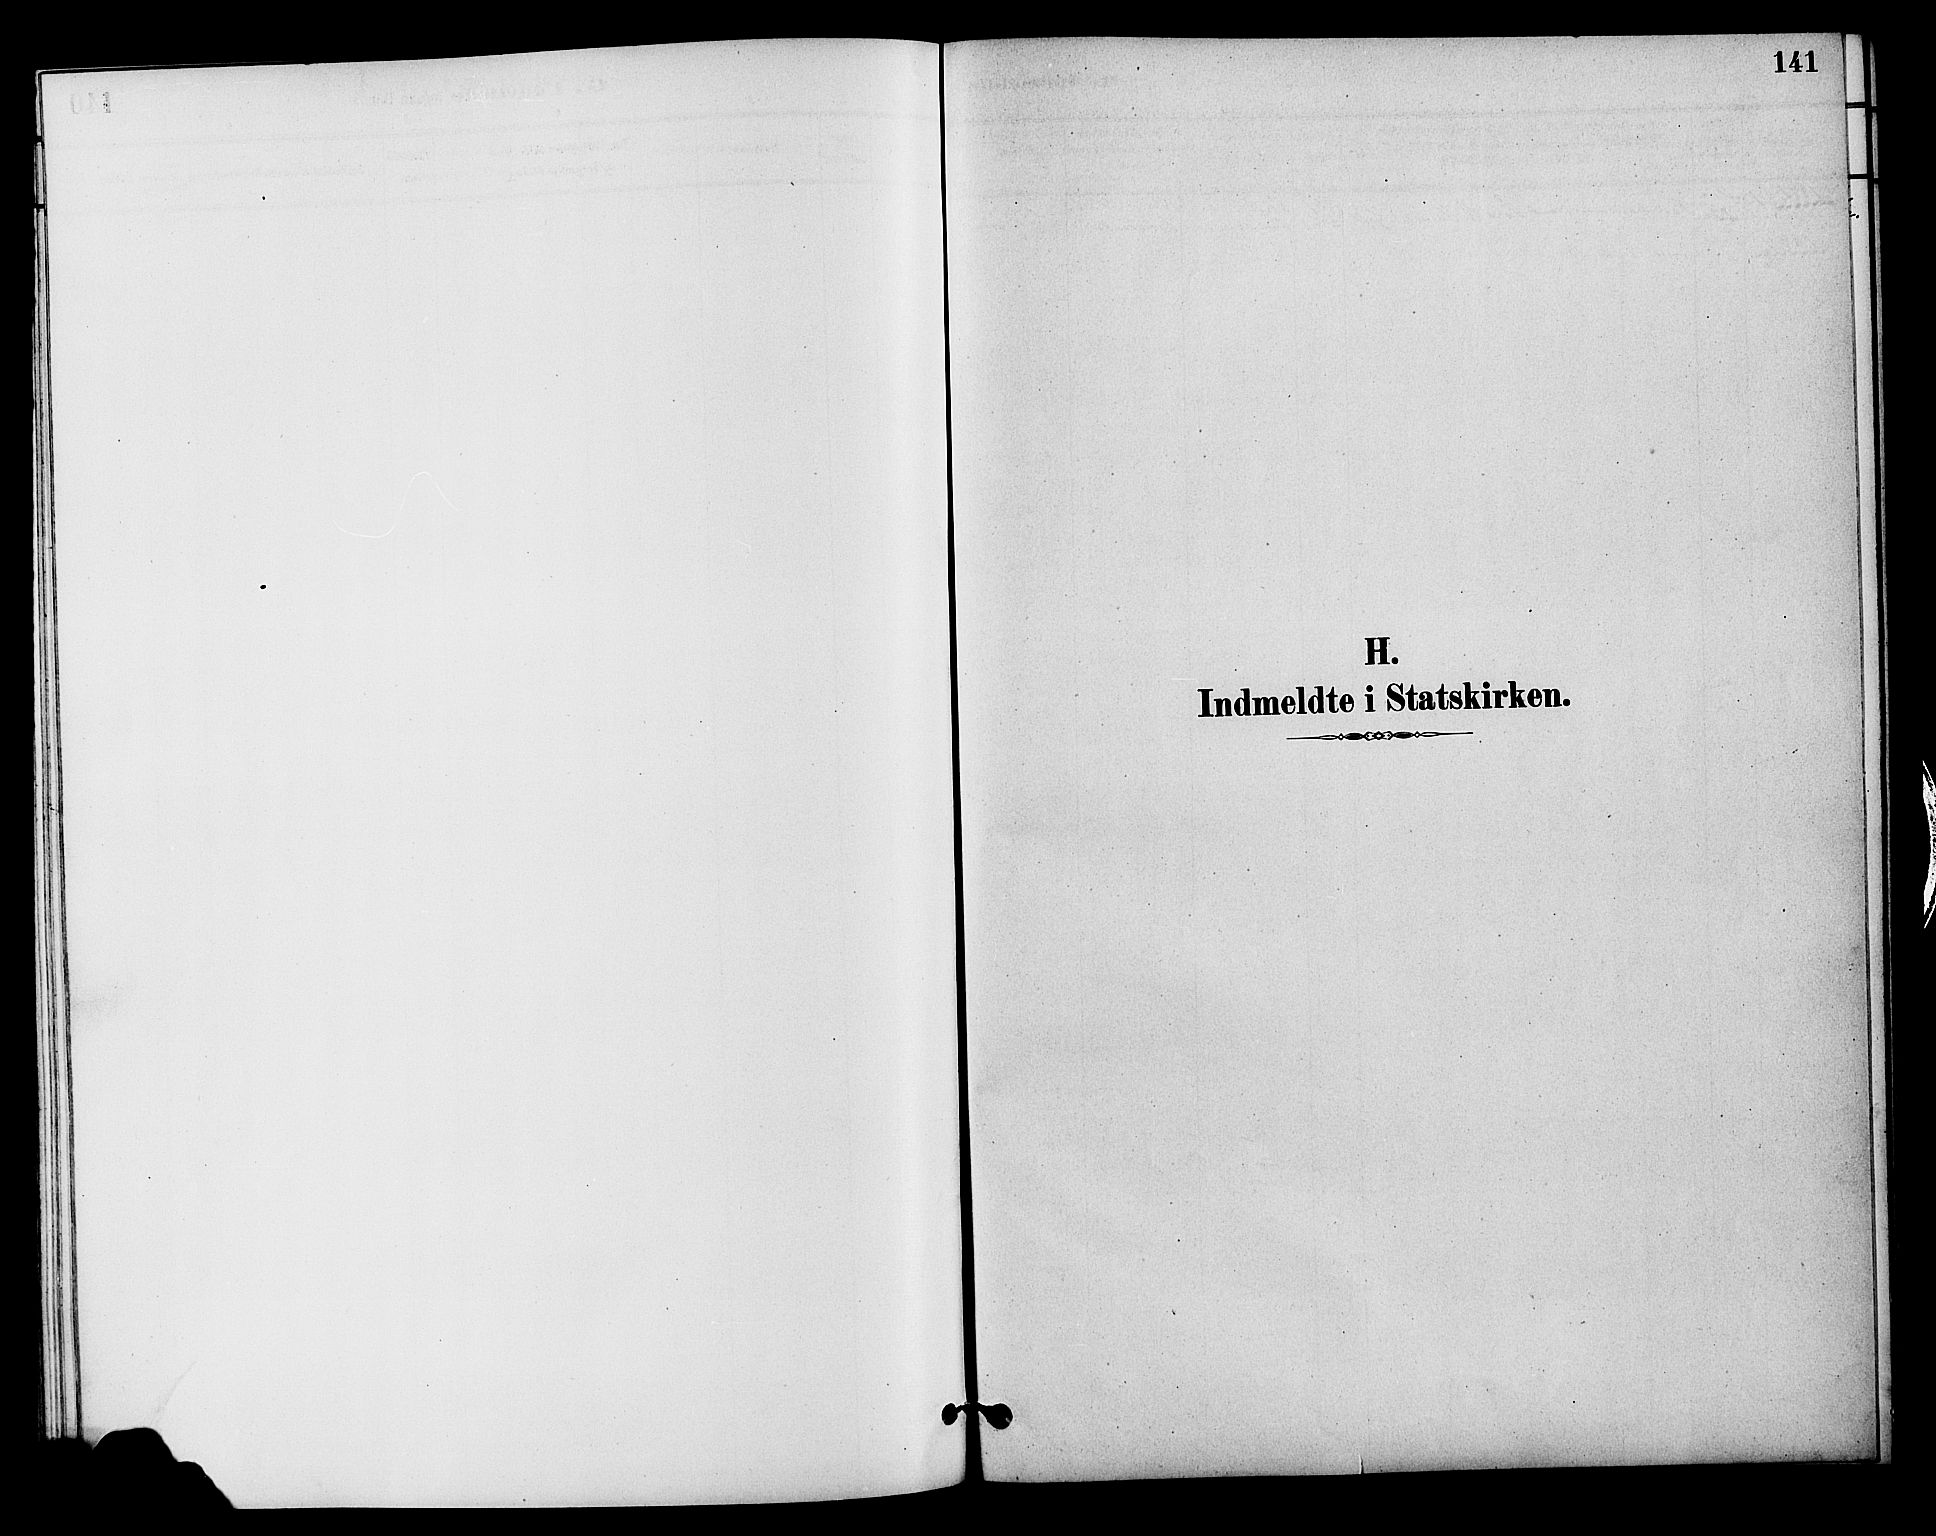 SAH, Vestre Slidre prestekontor, Parish register (copy) no. 4, 1881-1912, p. 141